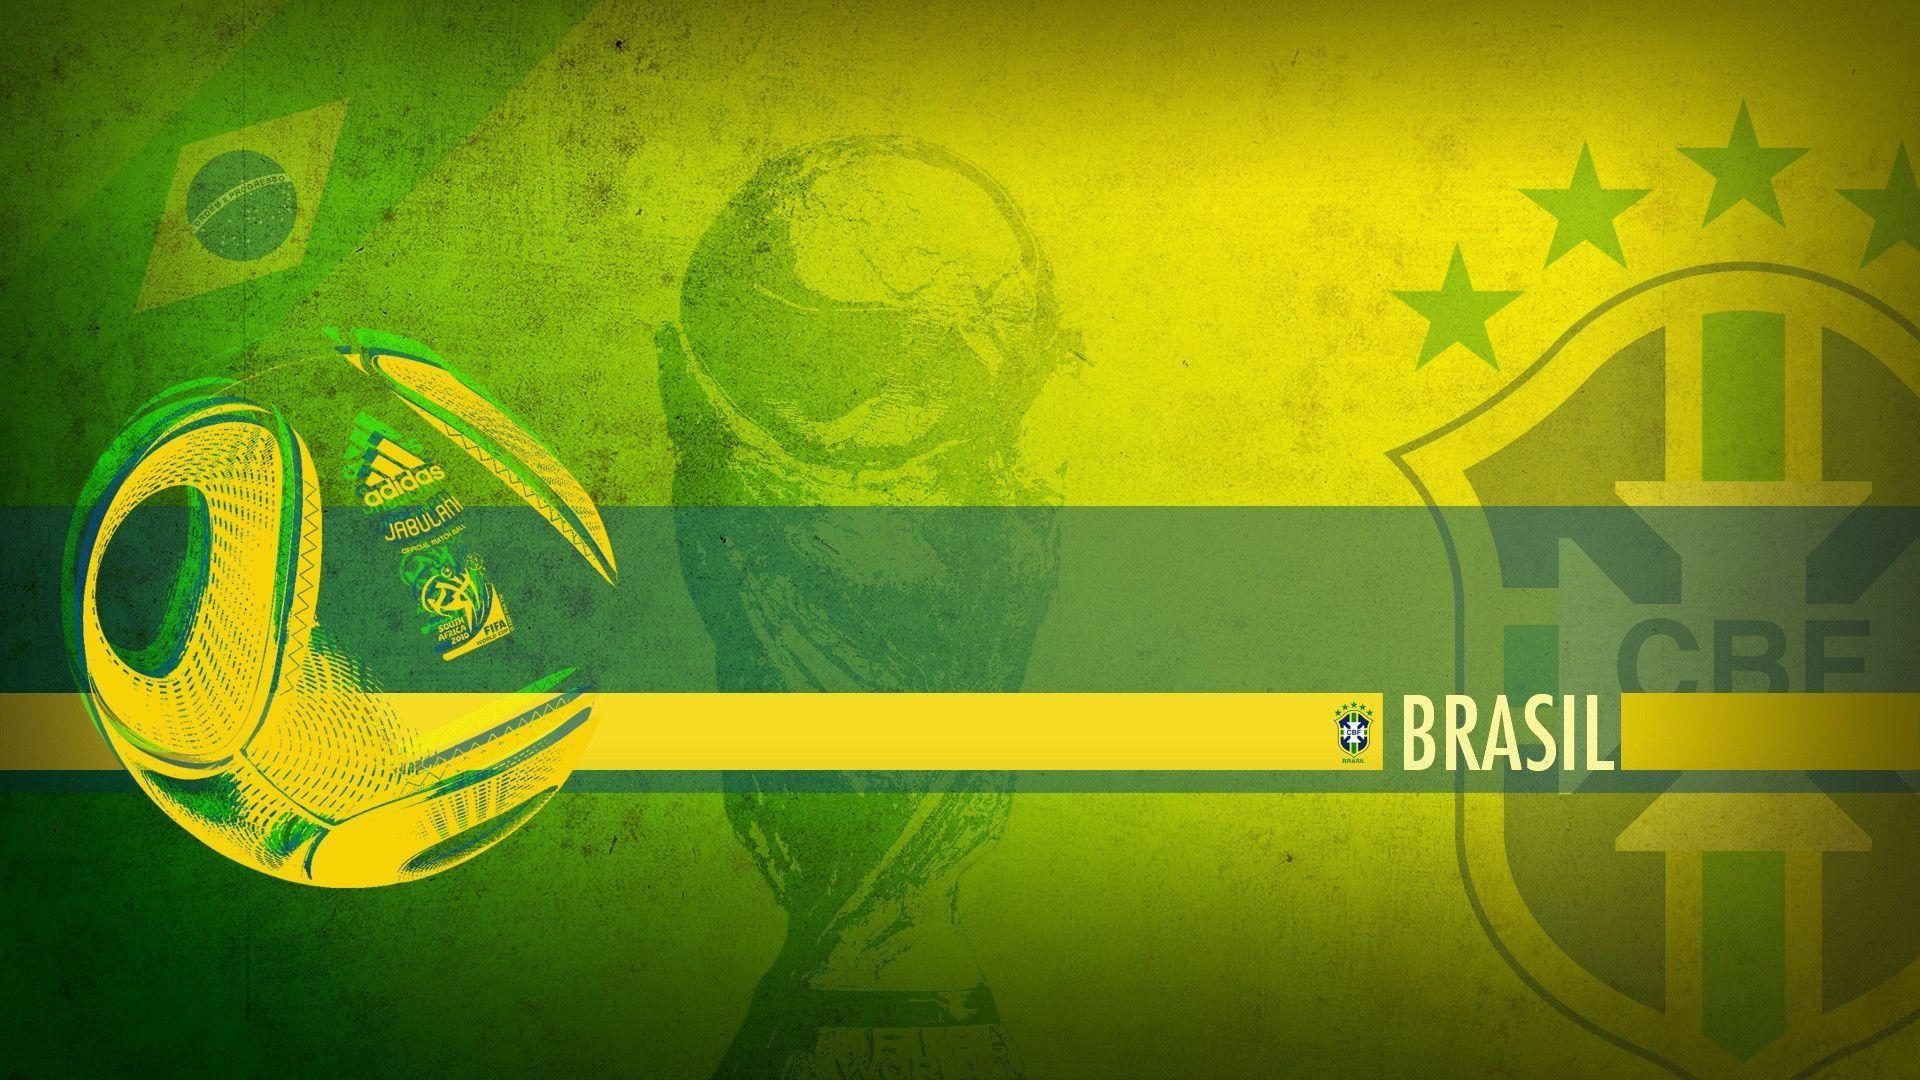 Brazil Soccer Wallpapers 1920x1080